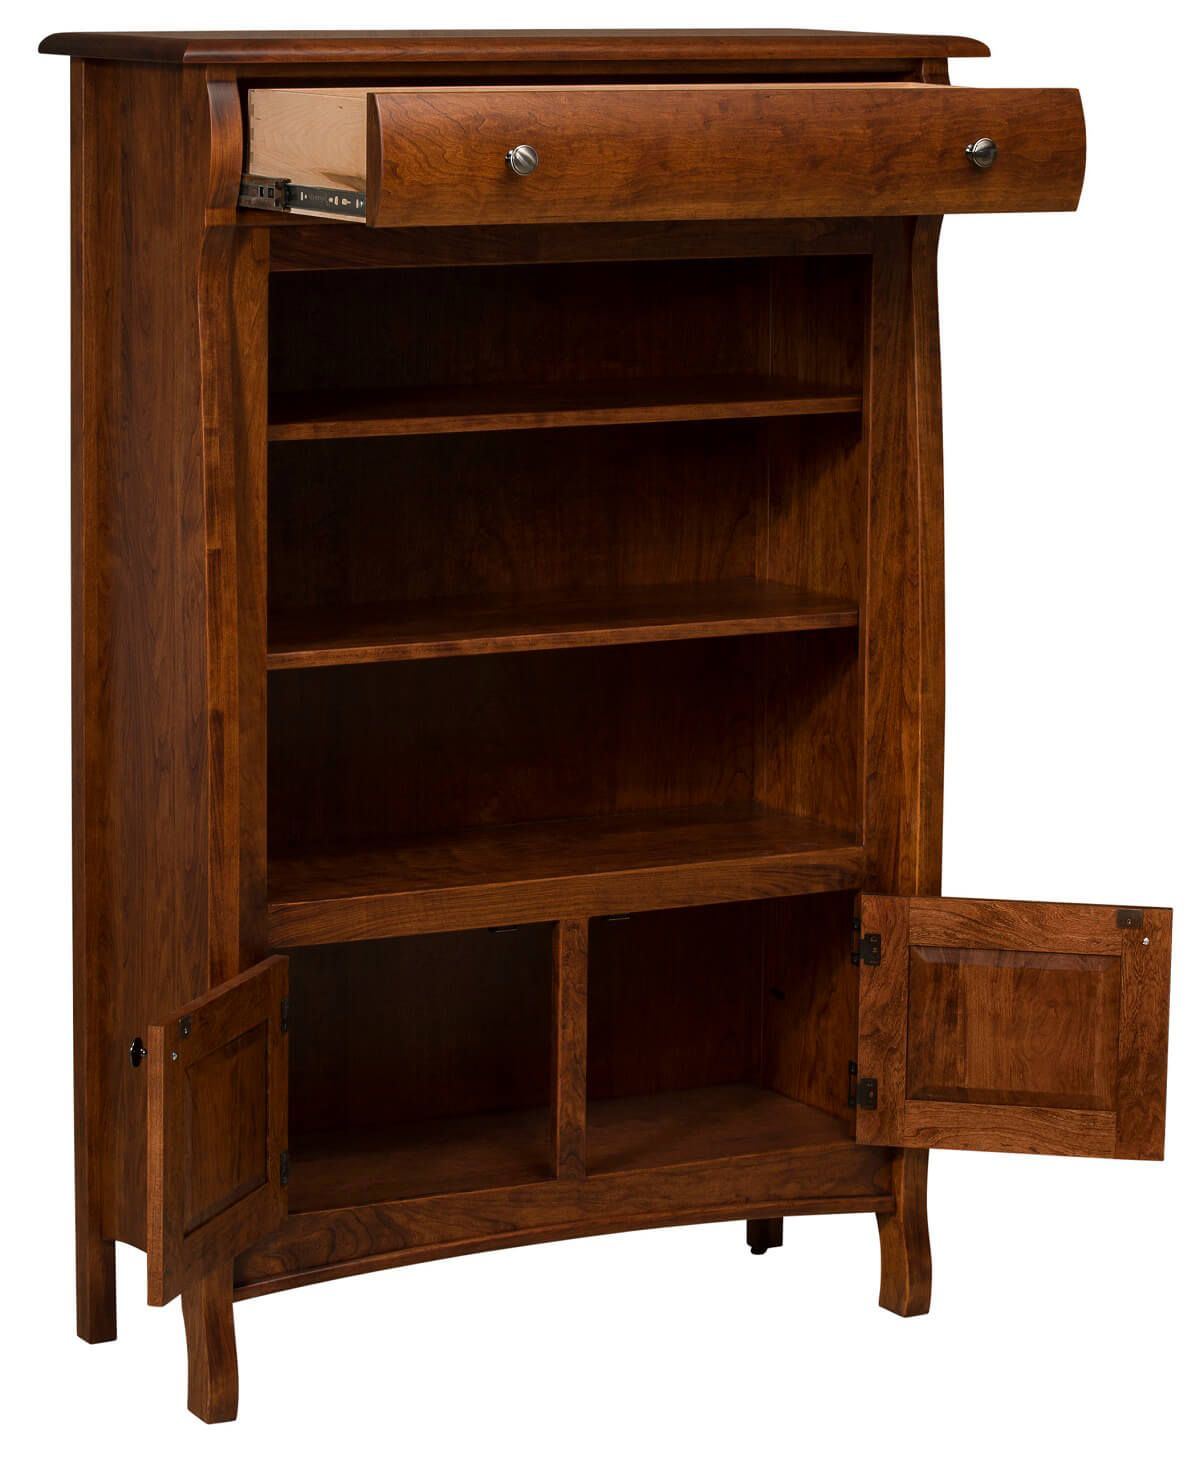 West Estates Child's Bookcase